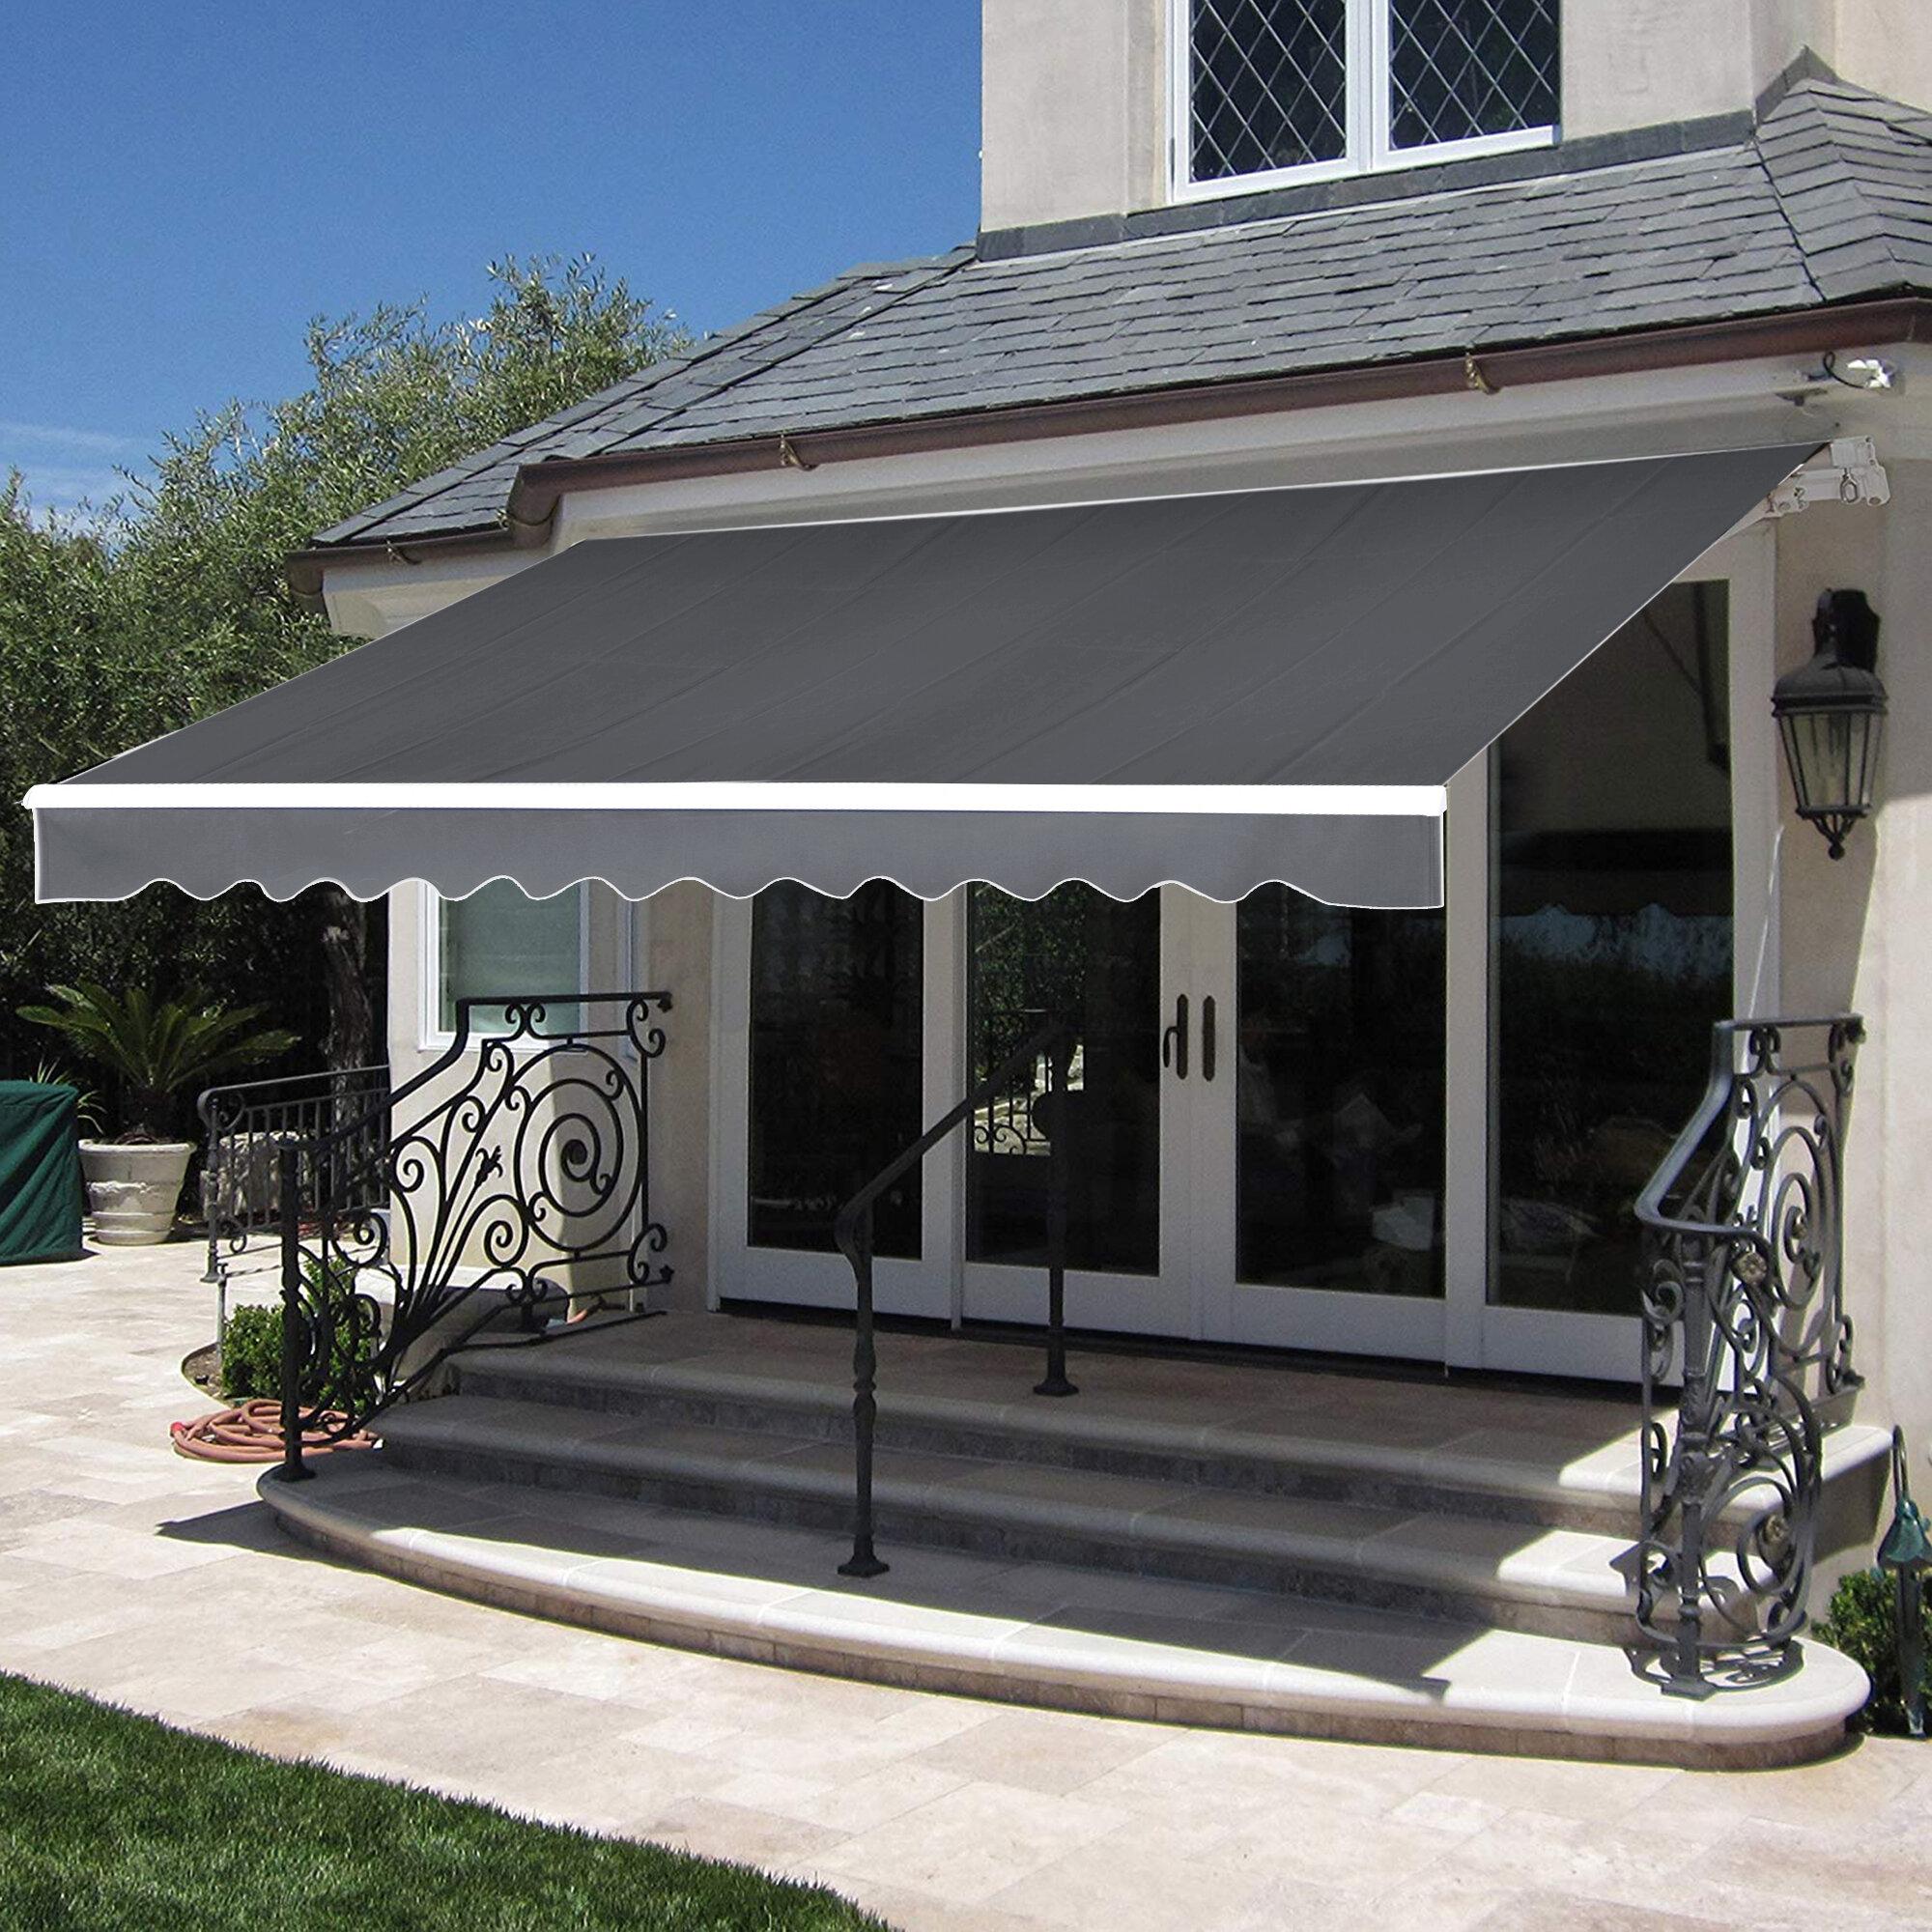 Arlmont Co Sparta 12 Ft W X 10 Ft D Fabric Retractable Standard Door Awning Reviews Wayfair